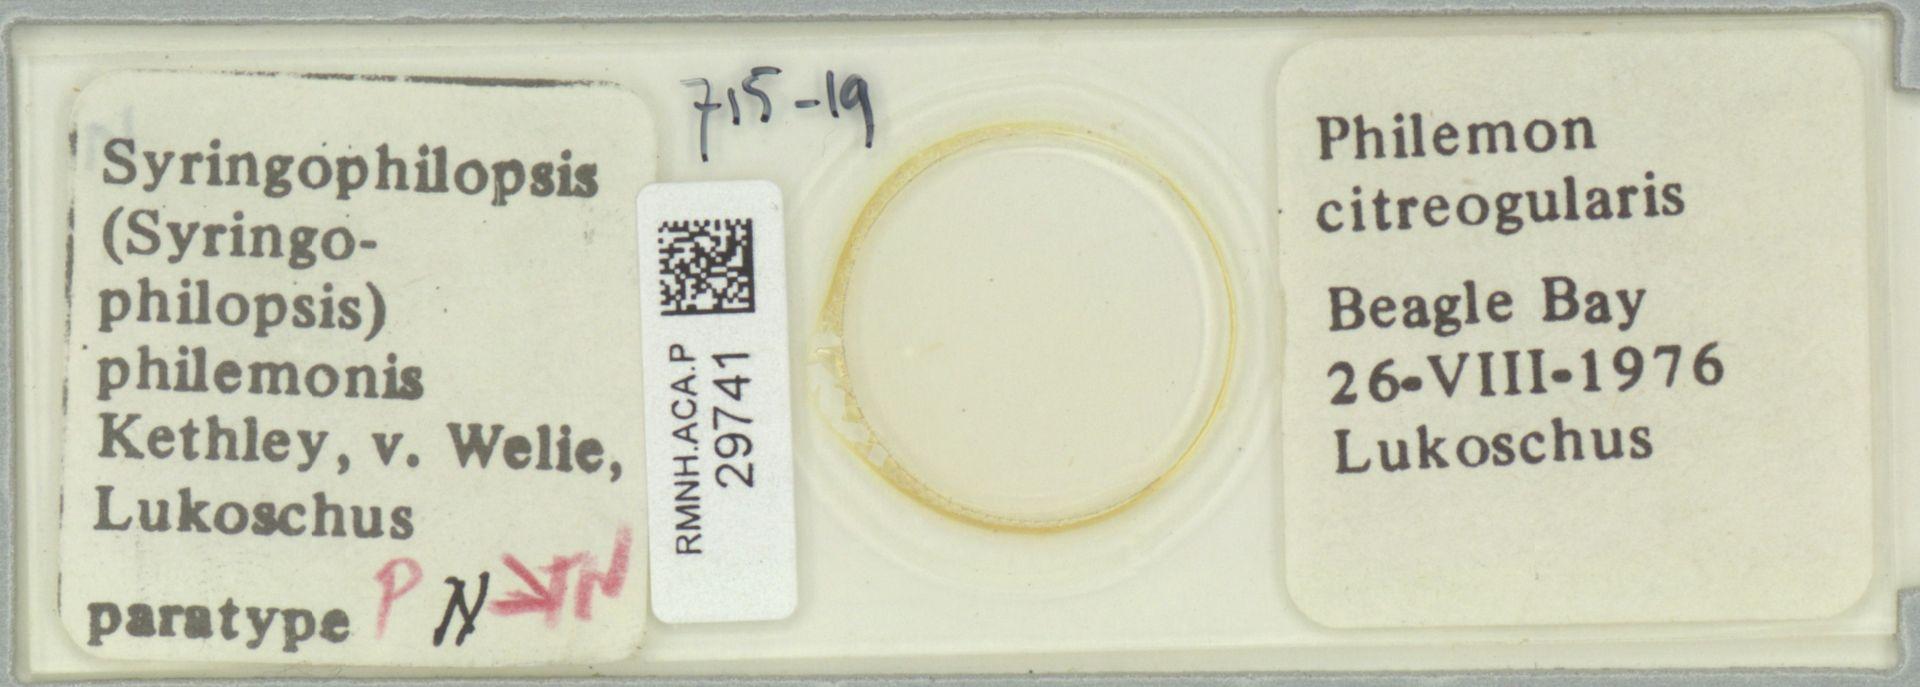 RMNH.ACA.P.29741 | Syringophilopsis (Syringophilopsis) philemonis Kethley, v. Welie, Lukoschus